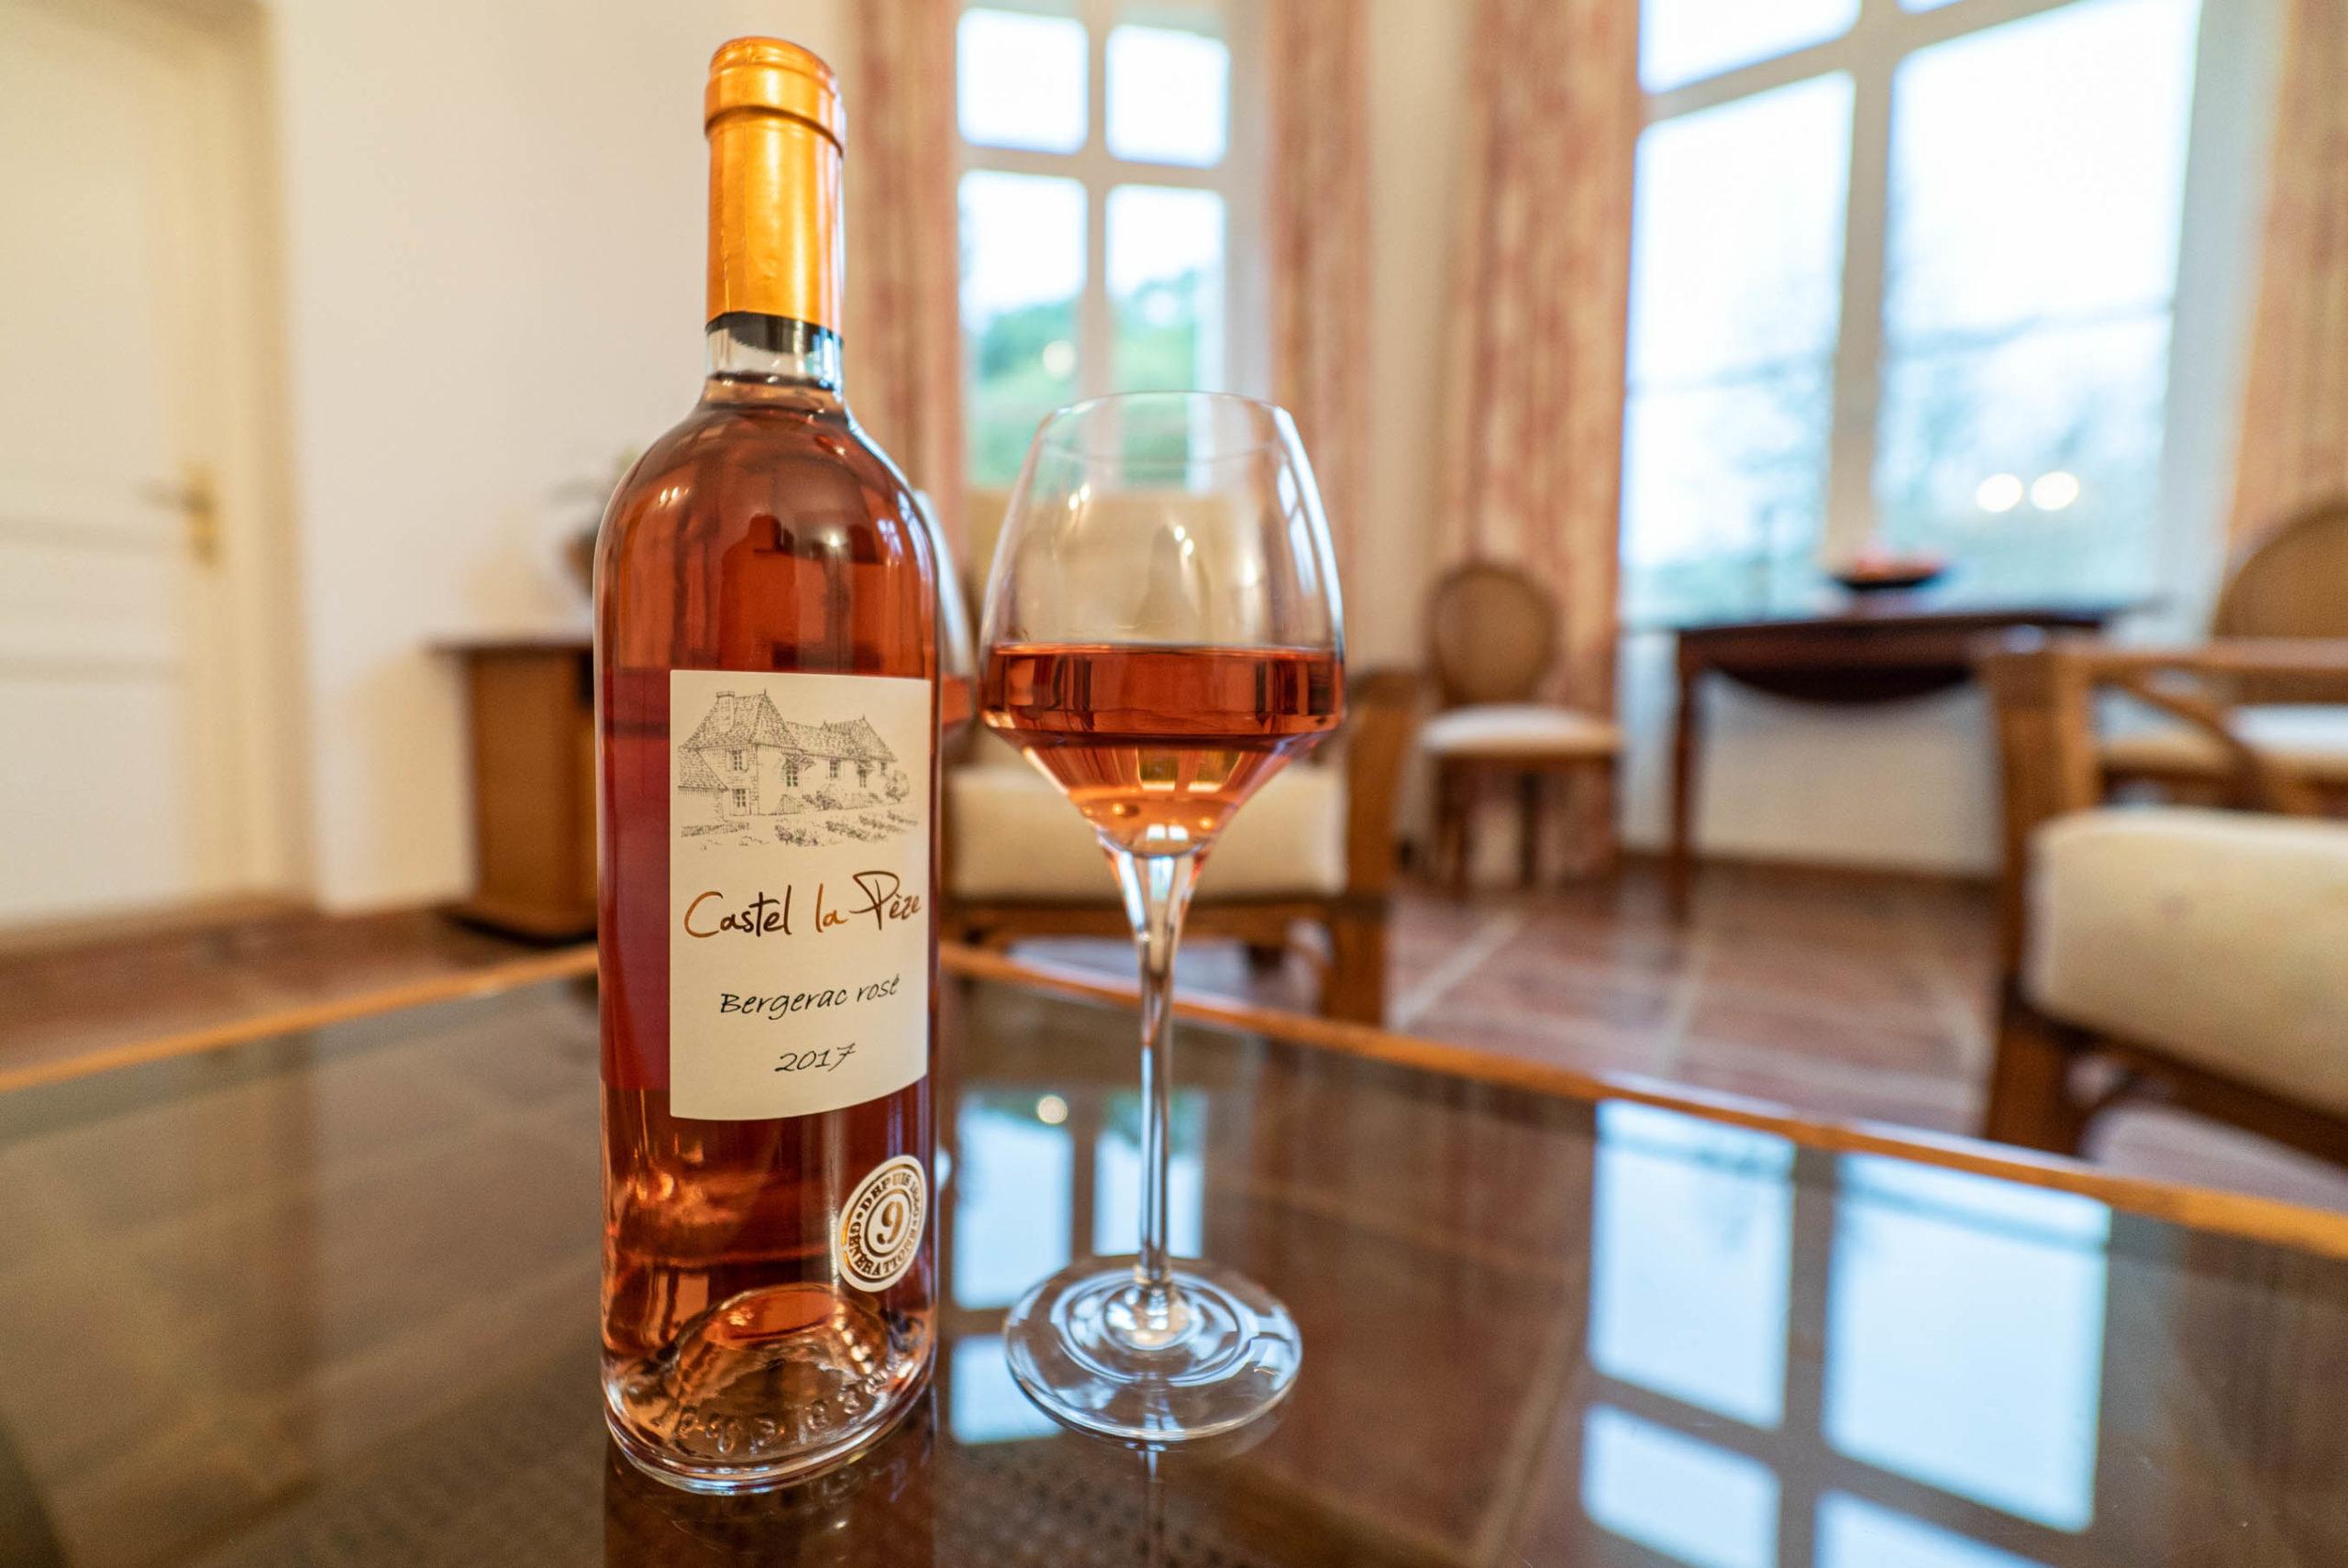 Bouteille de vin suite marquise chateau Rauly location bergerac Monbazillac